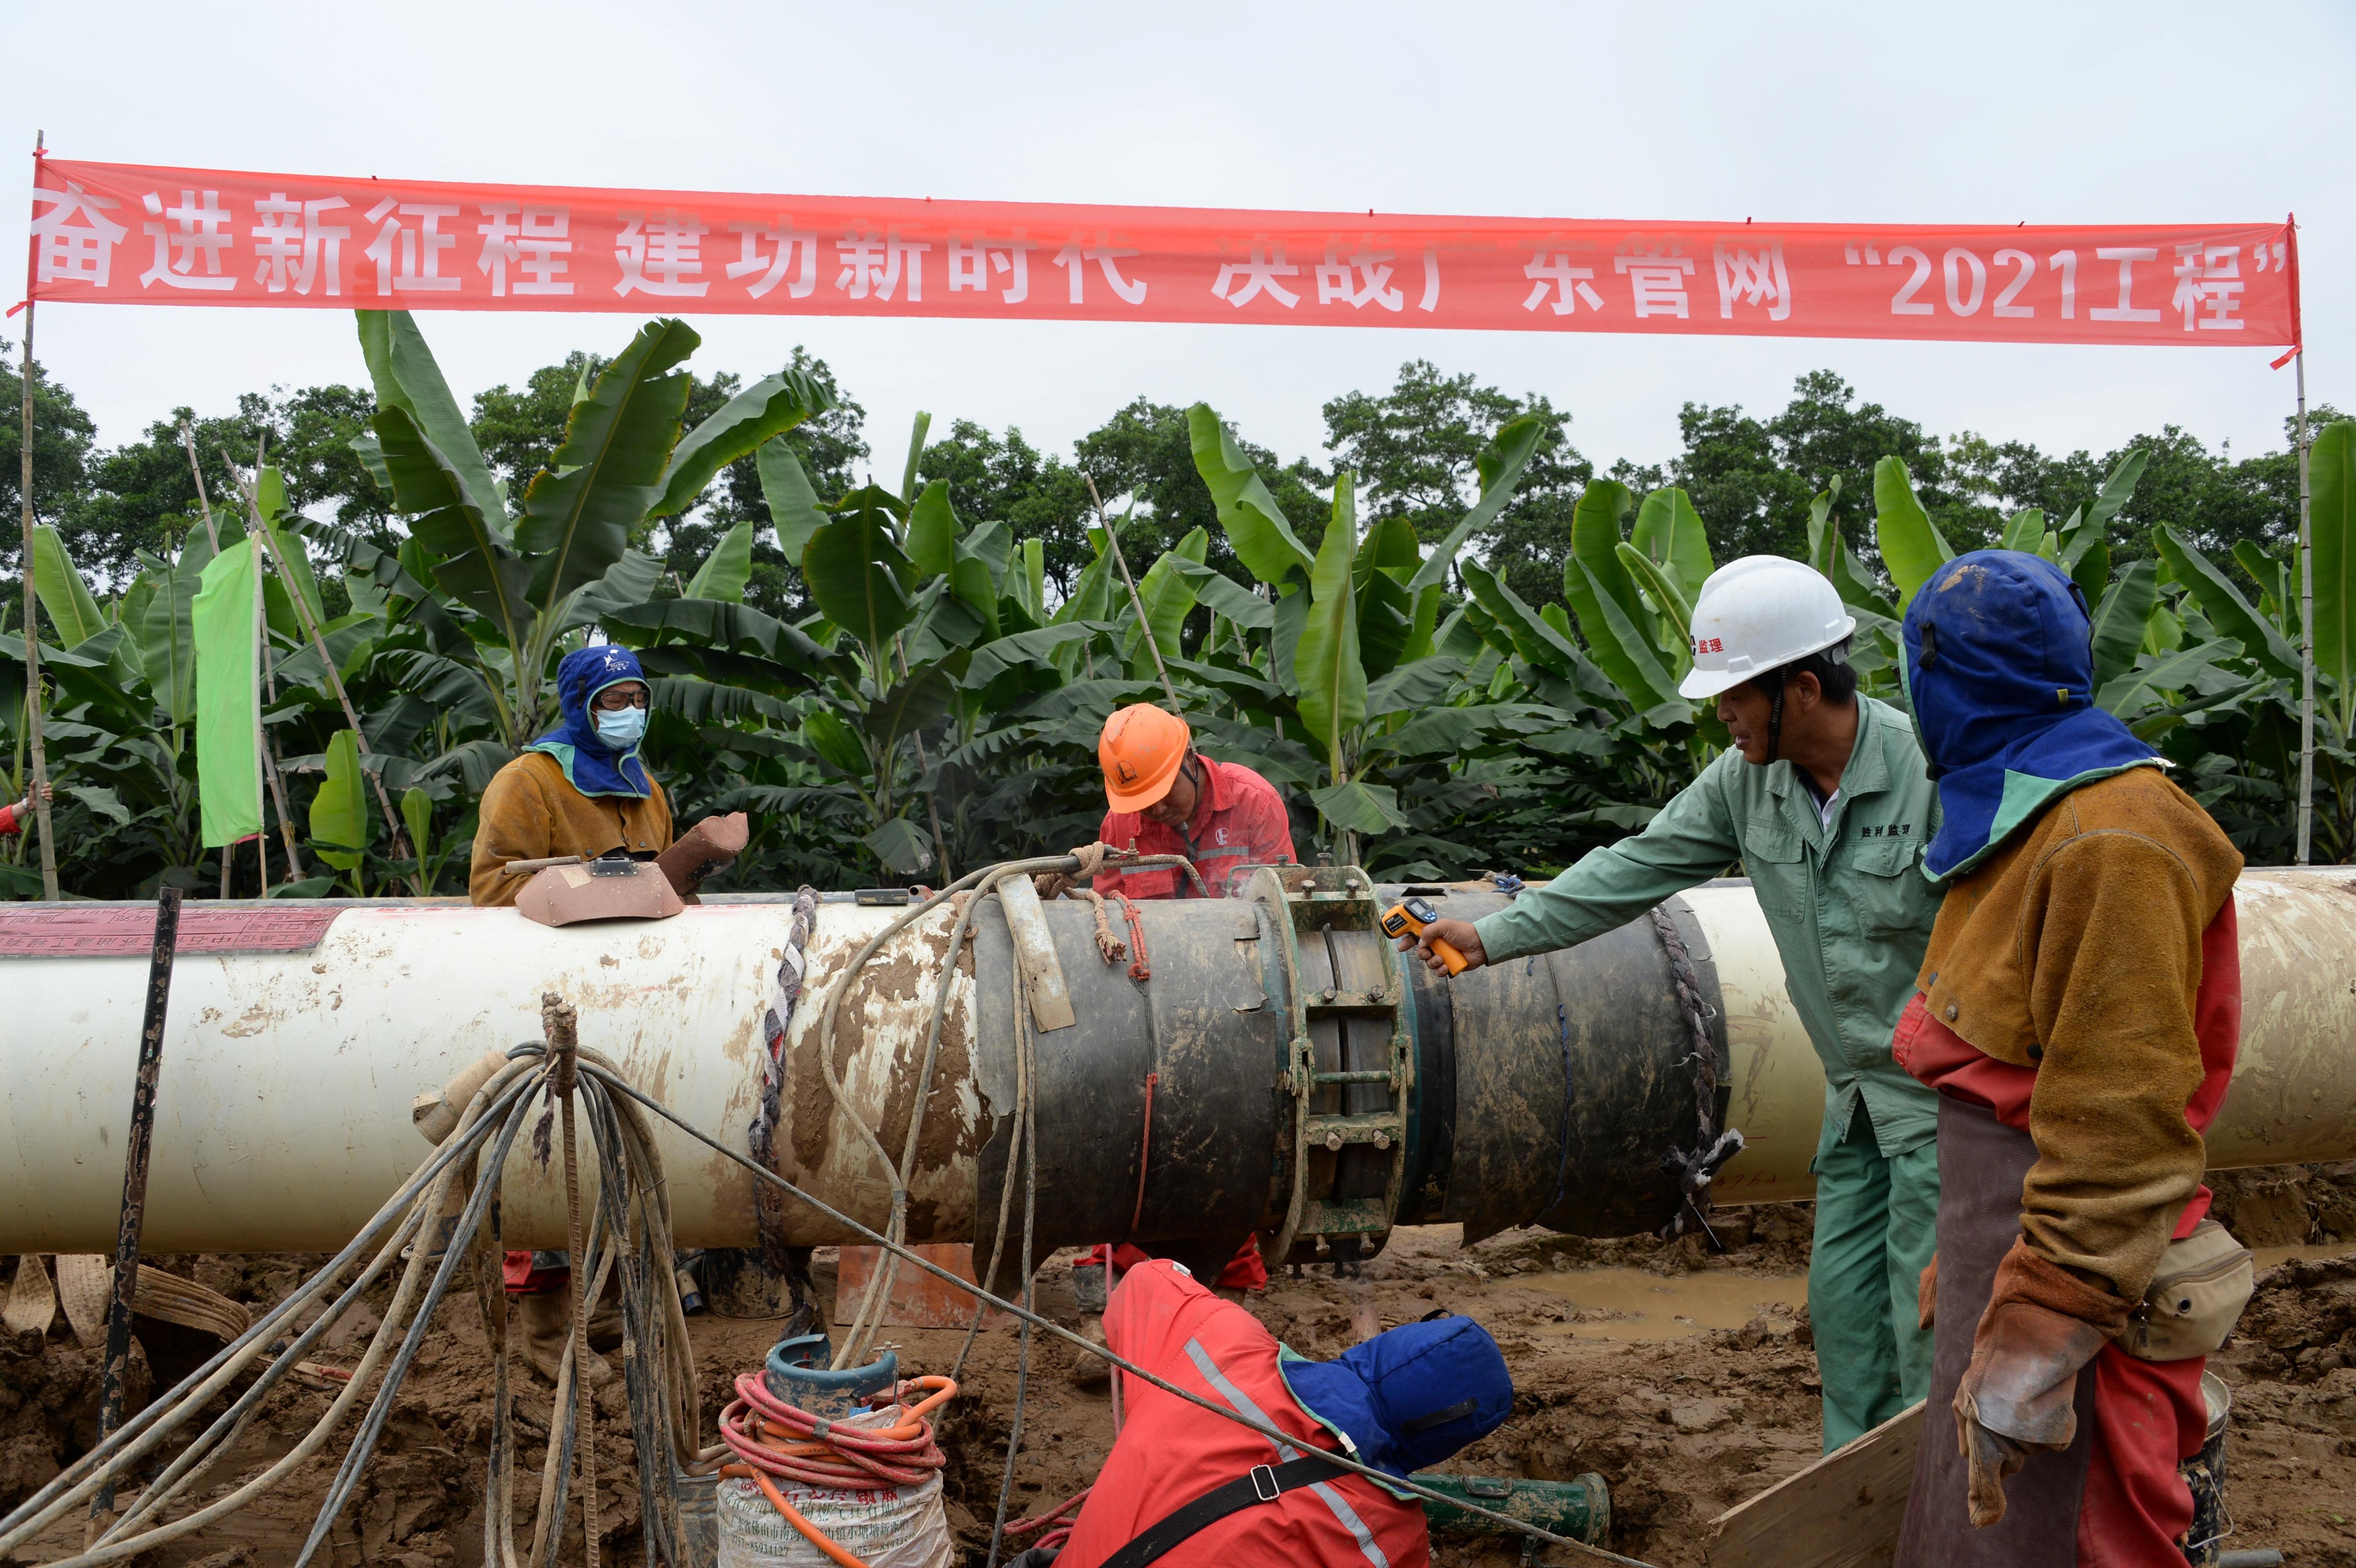 China gas demand to surge through 2035, coal to still offer stiff...